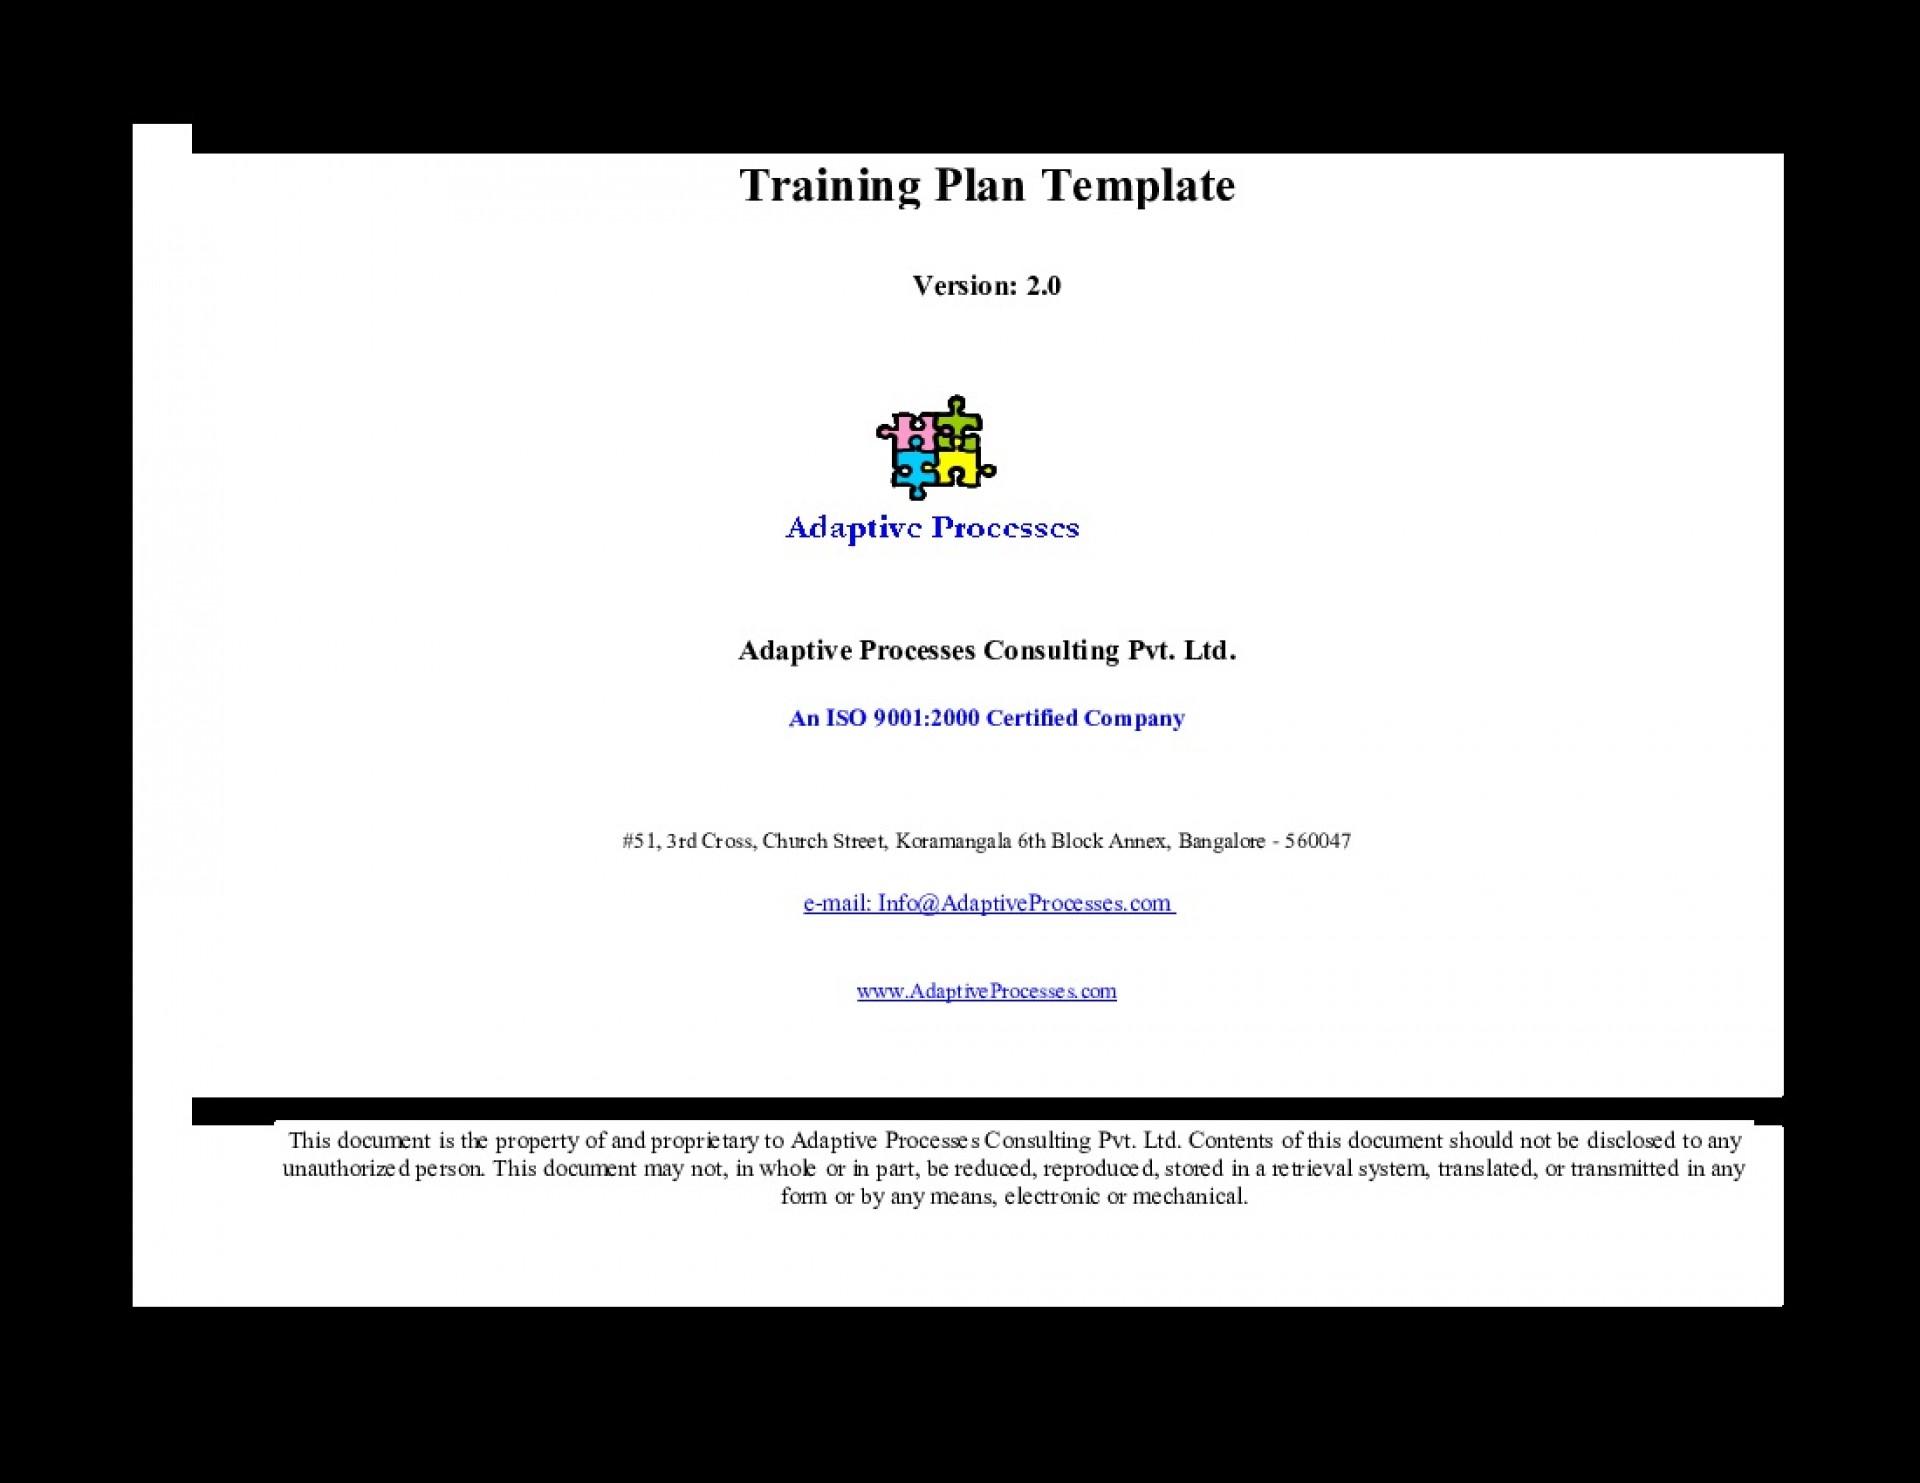 000 Unique Training Plan Template Excel Image  Free Download Schedule Format1920